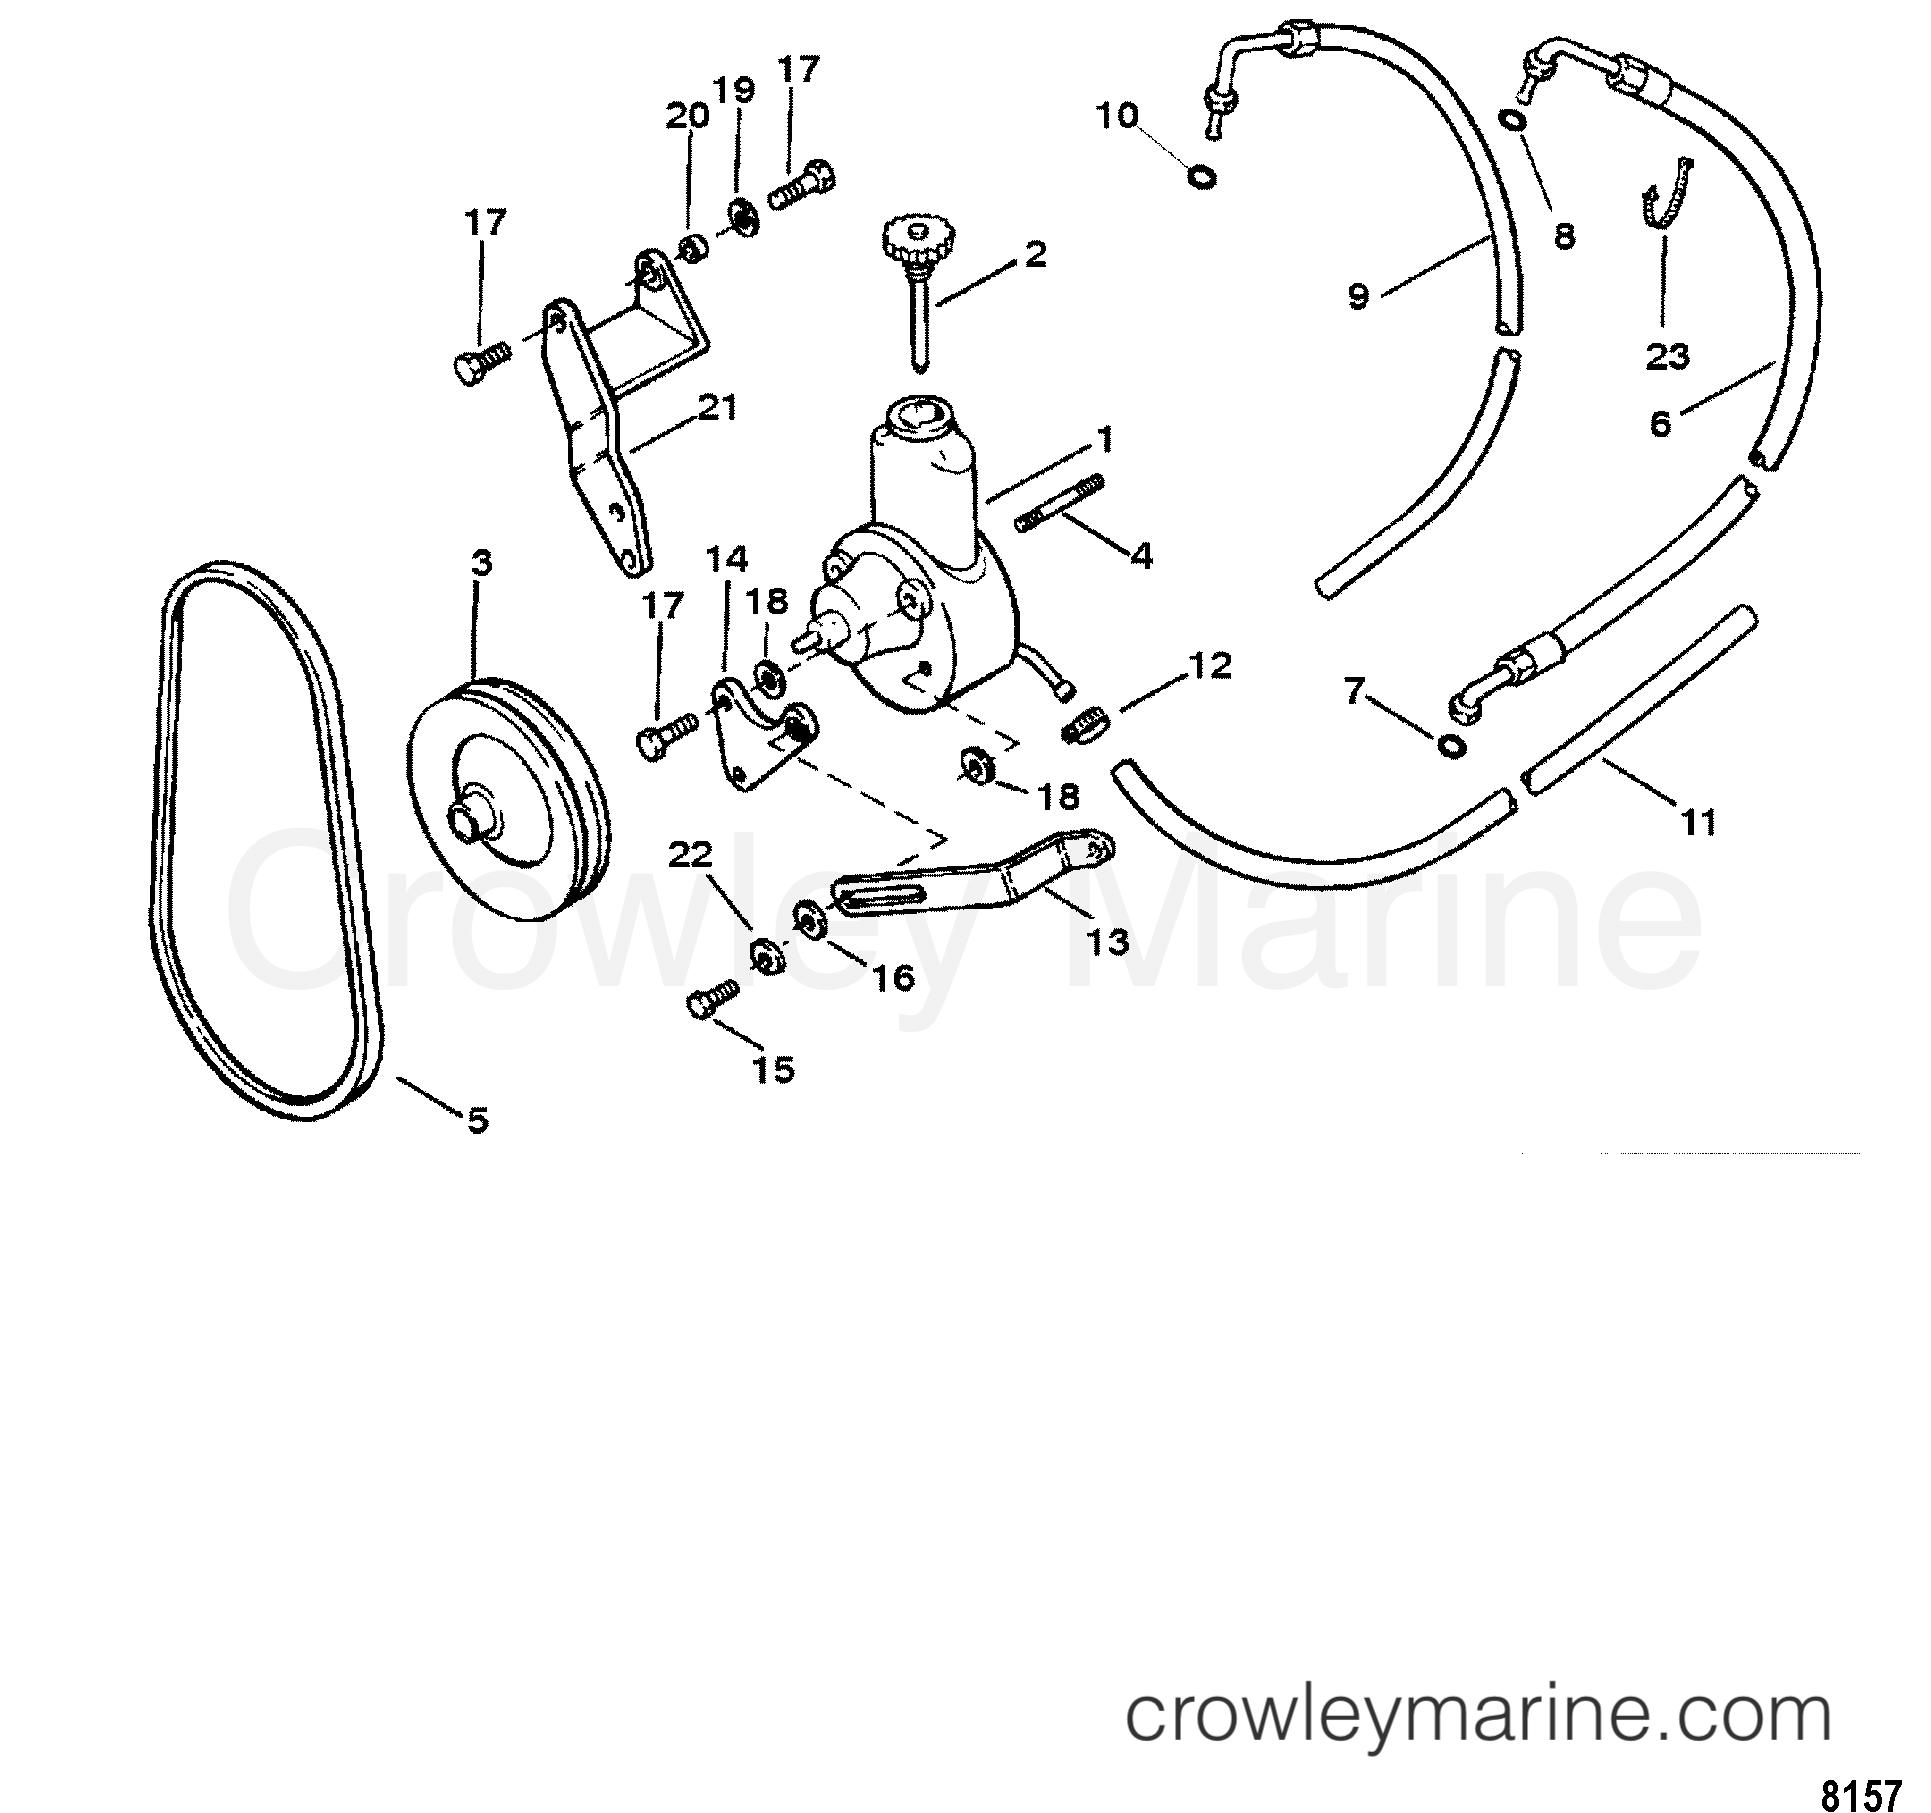 Electrical  ponents as well 3xfmw 88 Searay Mercuriser 5 0 350 V8 Alpha Sterndrive likewise Wiring Diagram Mercruiser 470 Starter additionally Alpha One Outdrive Trim Wiring Diagram as well Mercruiser 5 7 Wiring Harness Diagram. on 5 0 mercruiser inboard engine